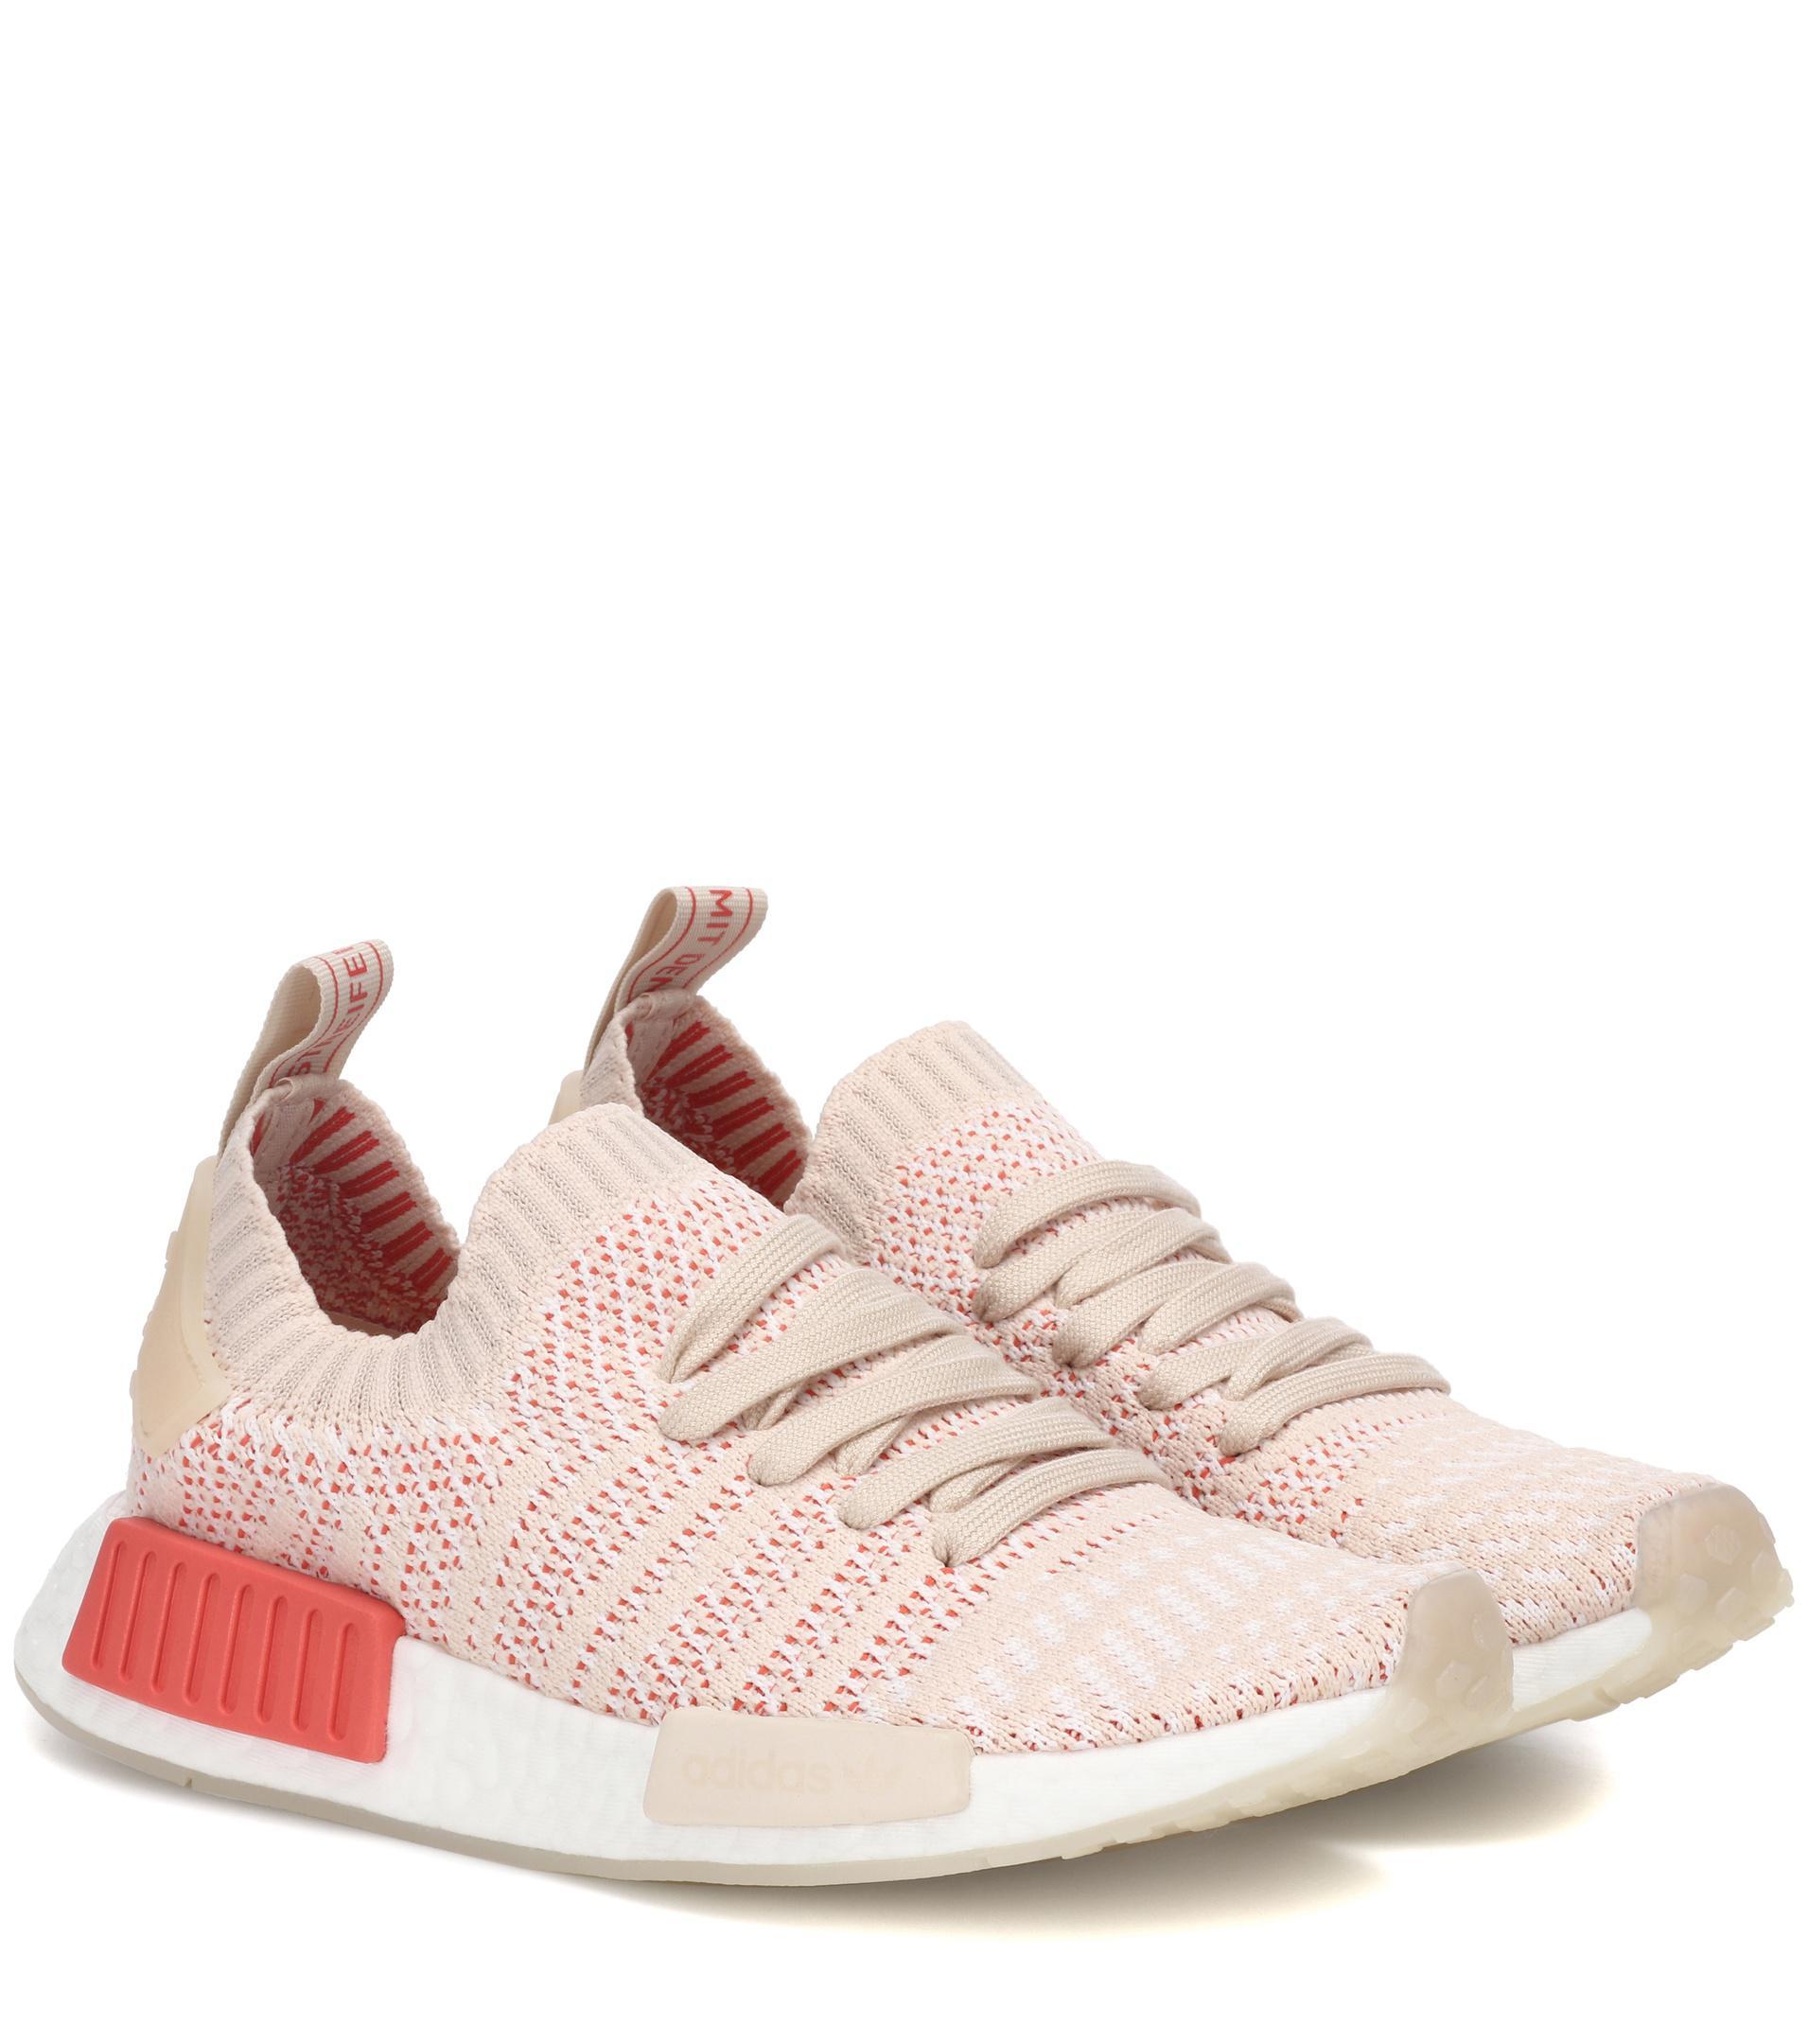 Lyst adidas Originals NMD R1 stlt primeknit zapatilla en color rosa